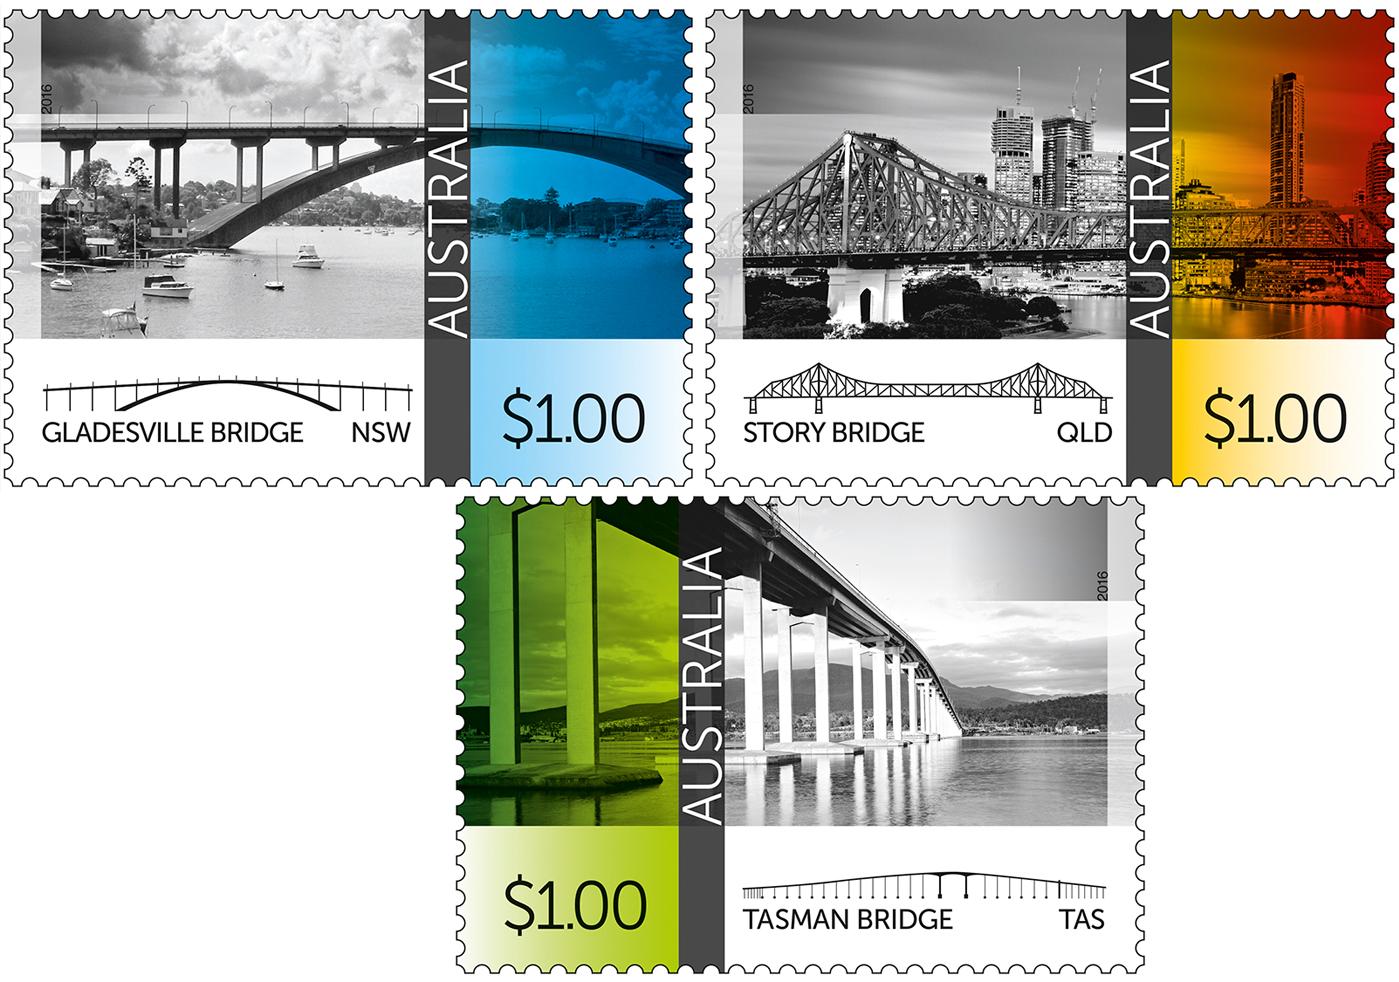 bridges-australia-stamps-l